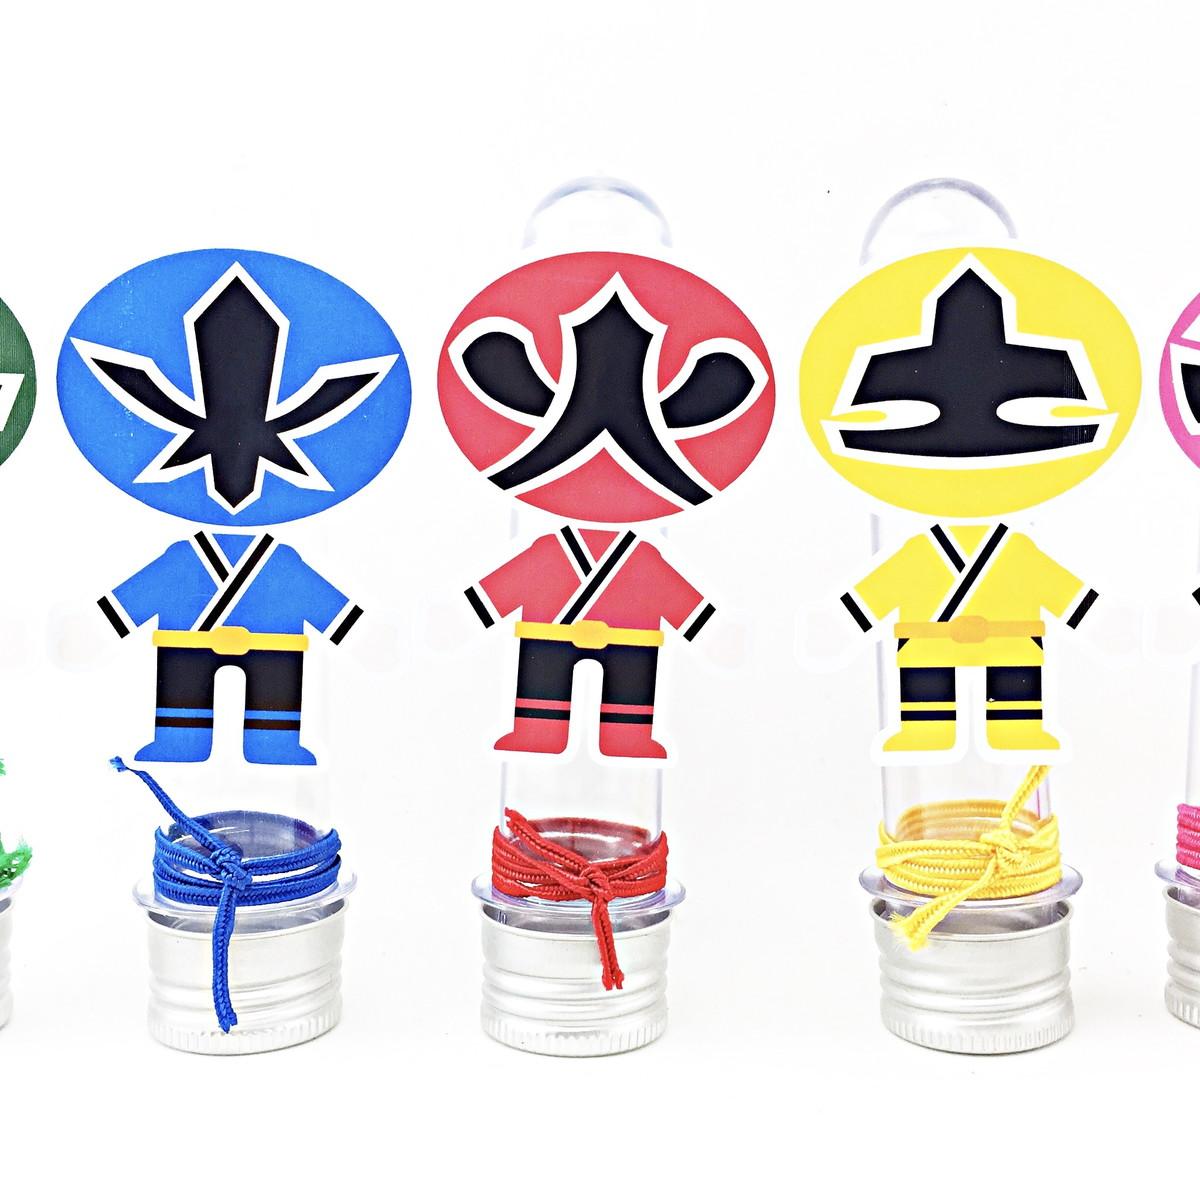 Tubete - Power Rangers  - Marina Levy Festas